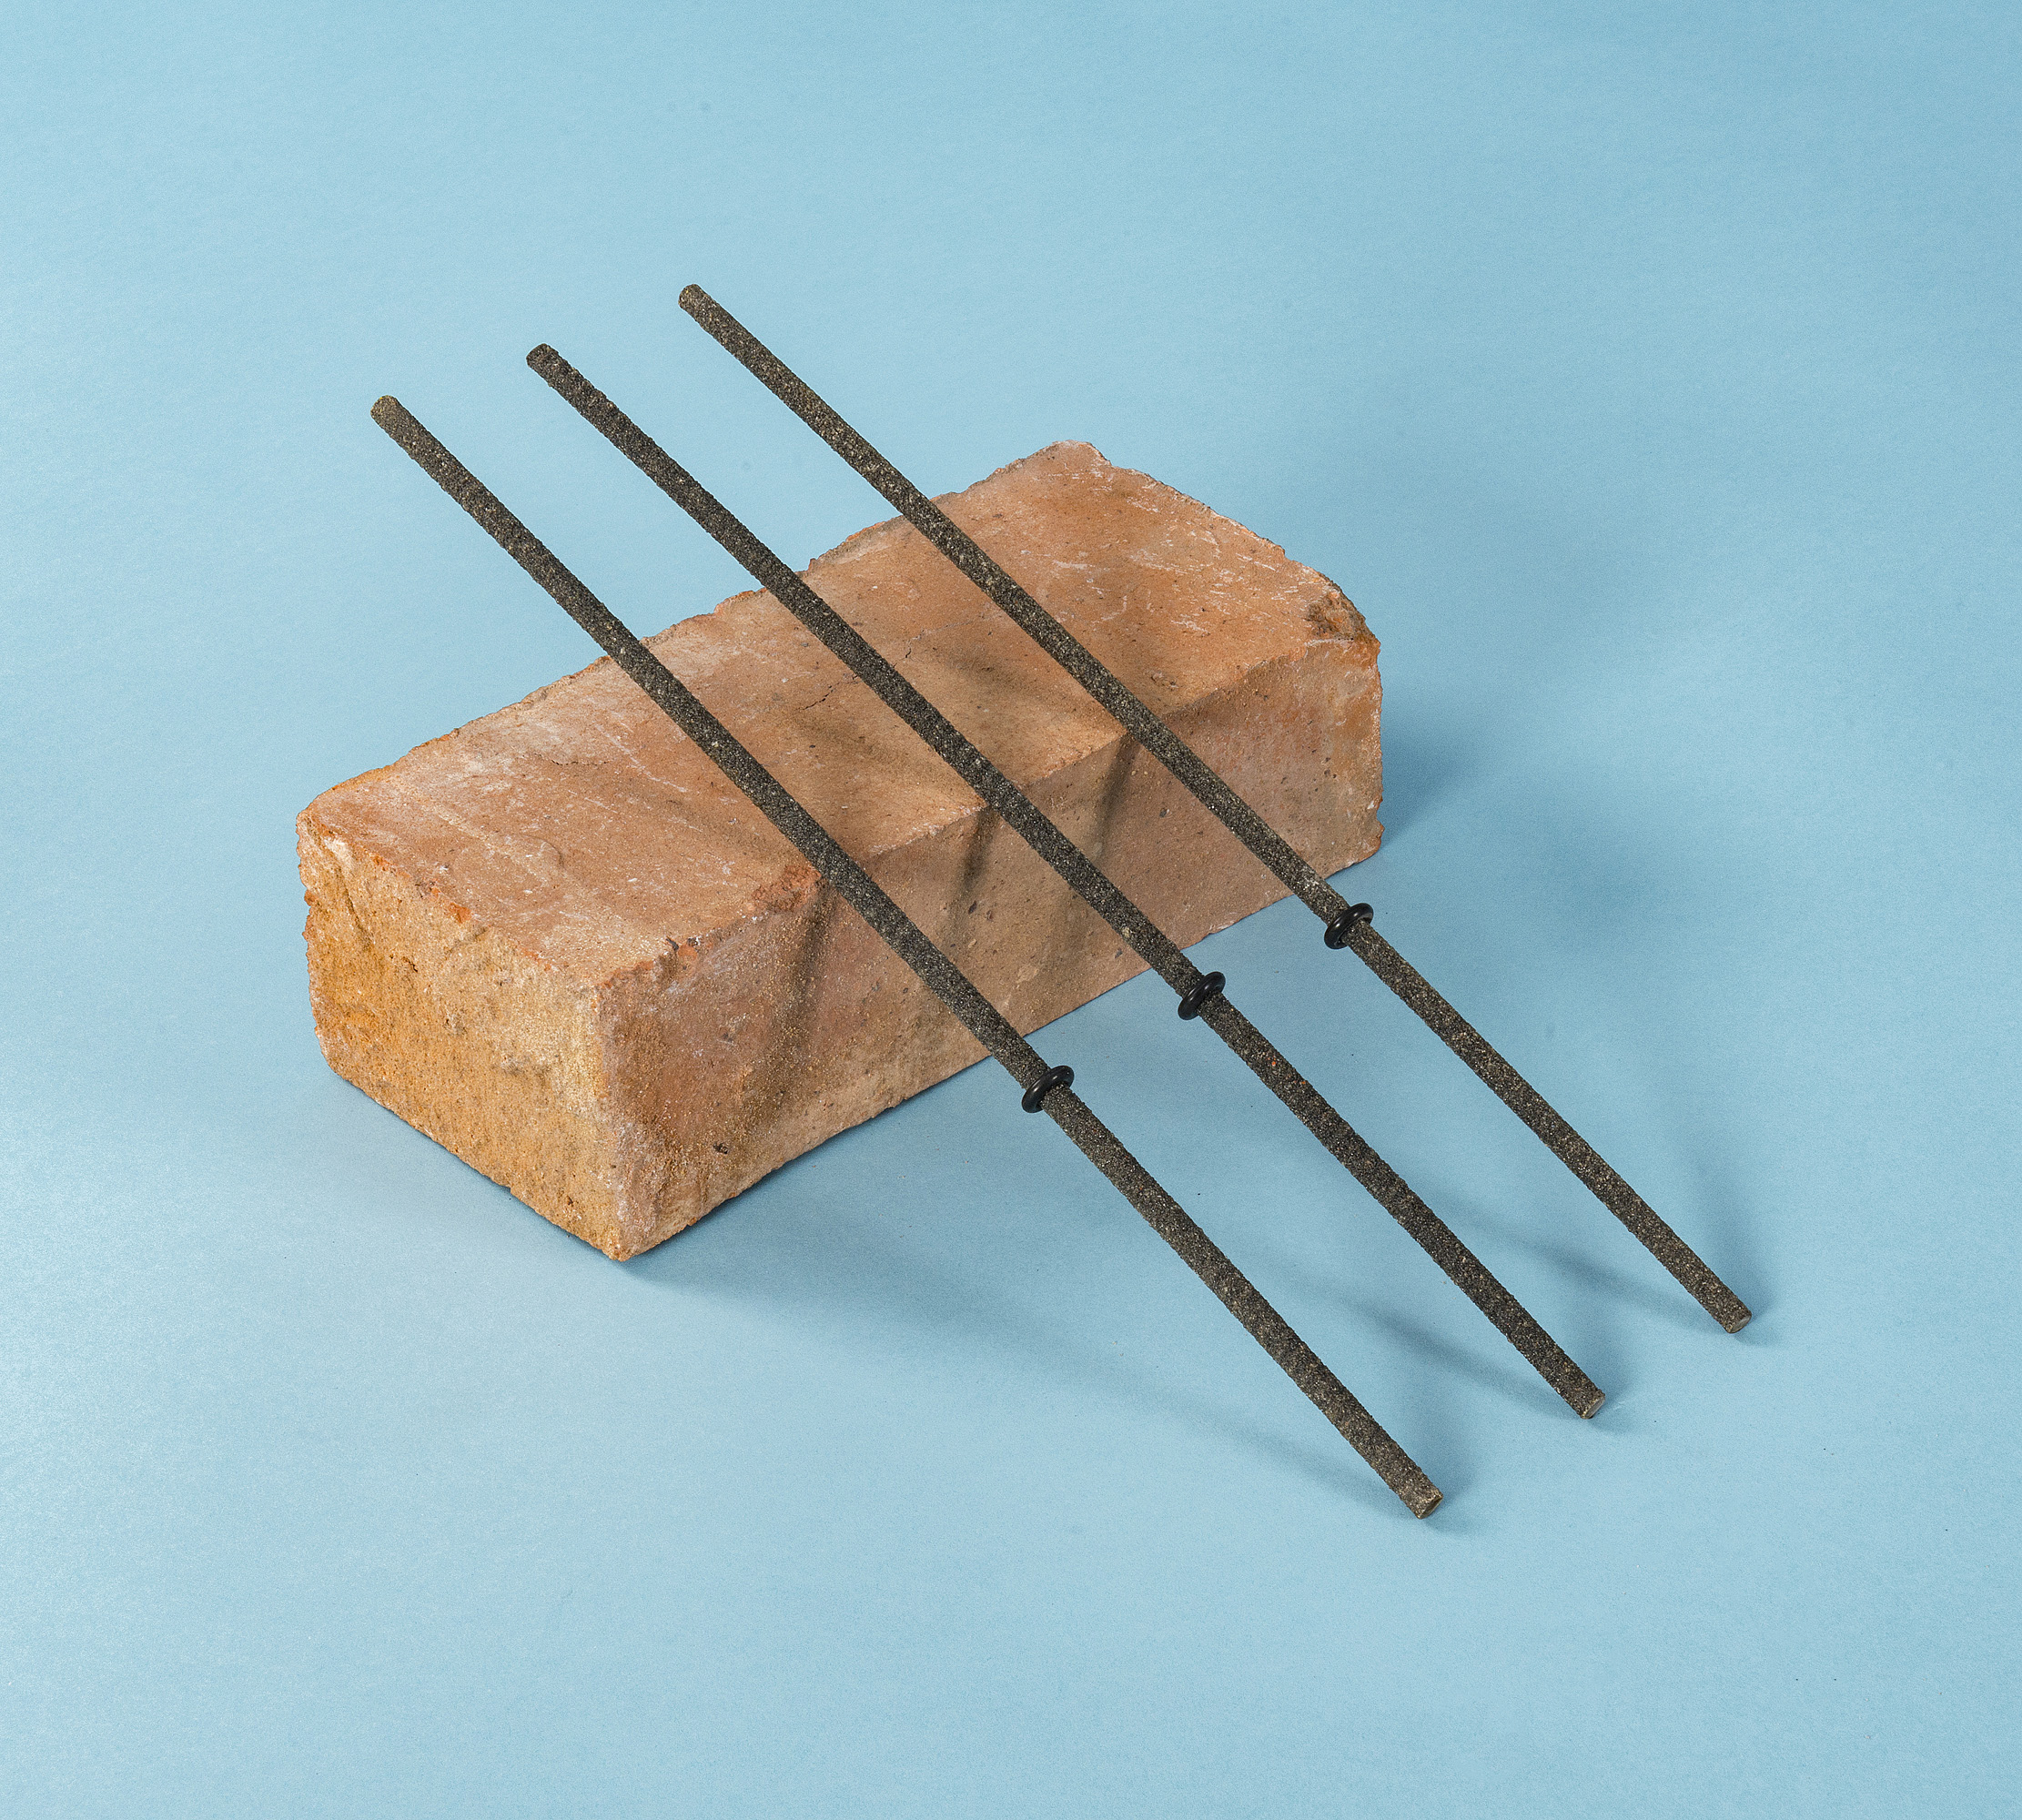 Cavity Wall Insulation Carbon Black : Teplo tie basalt cavity tes twistfix